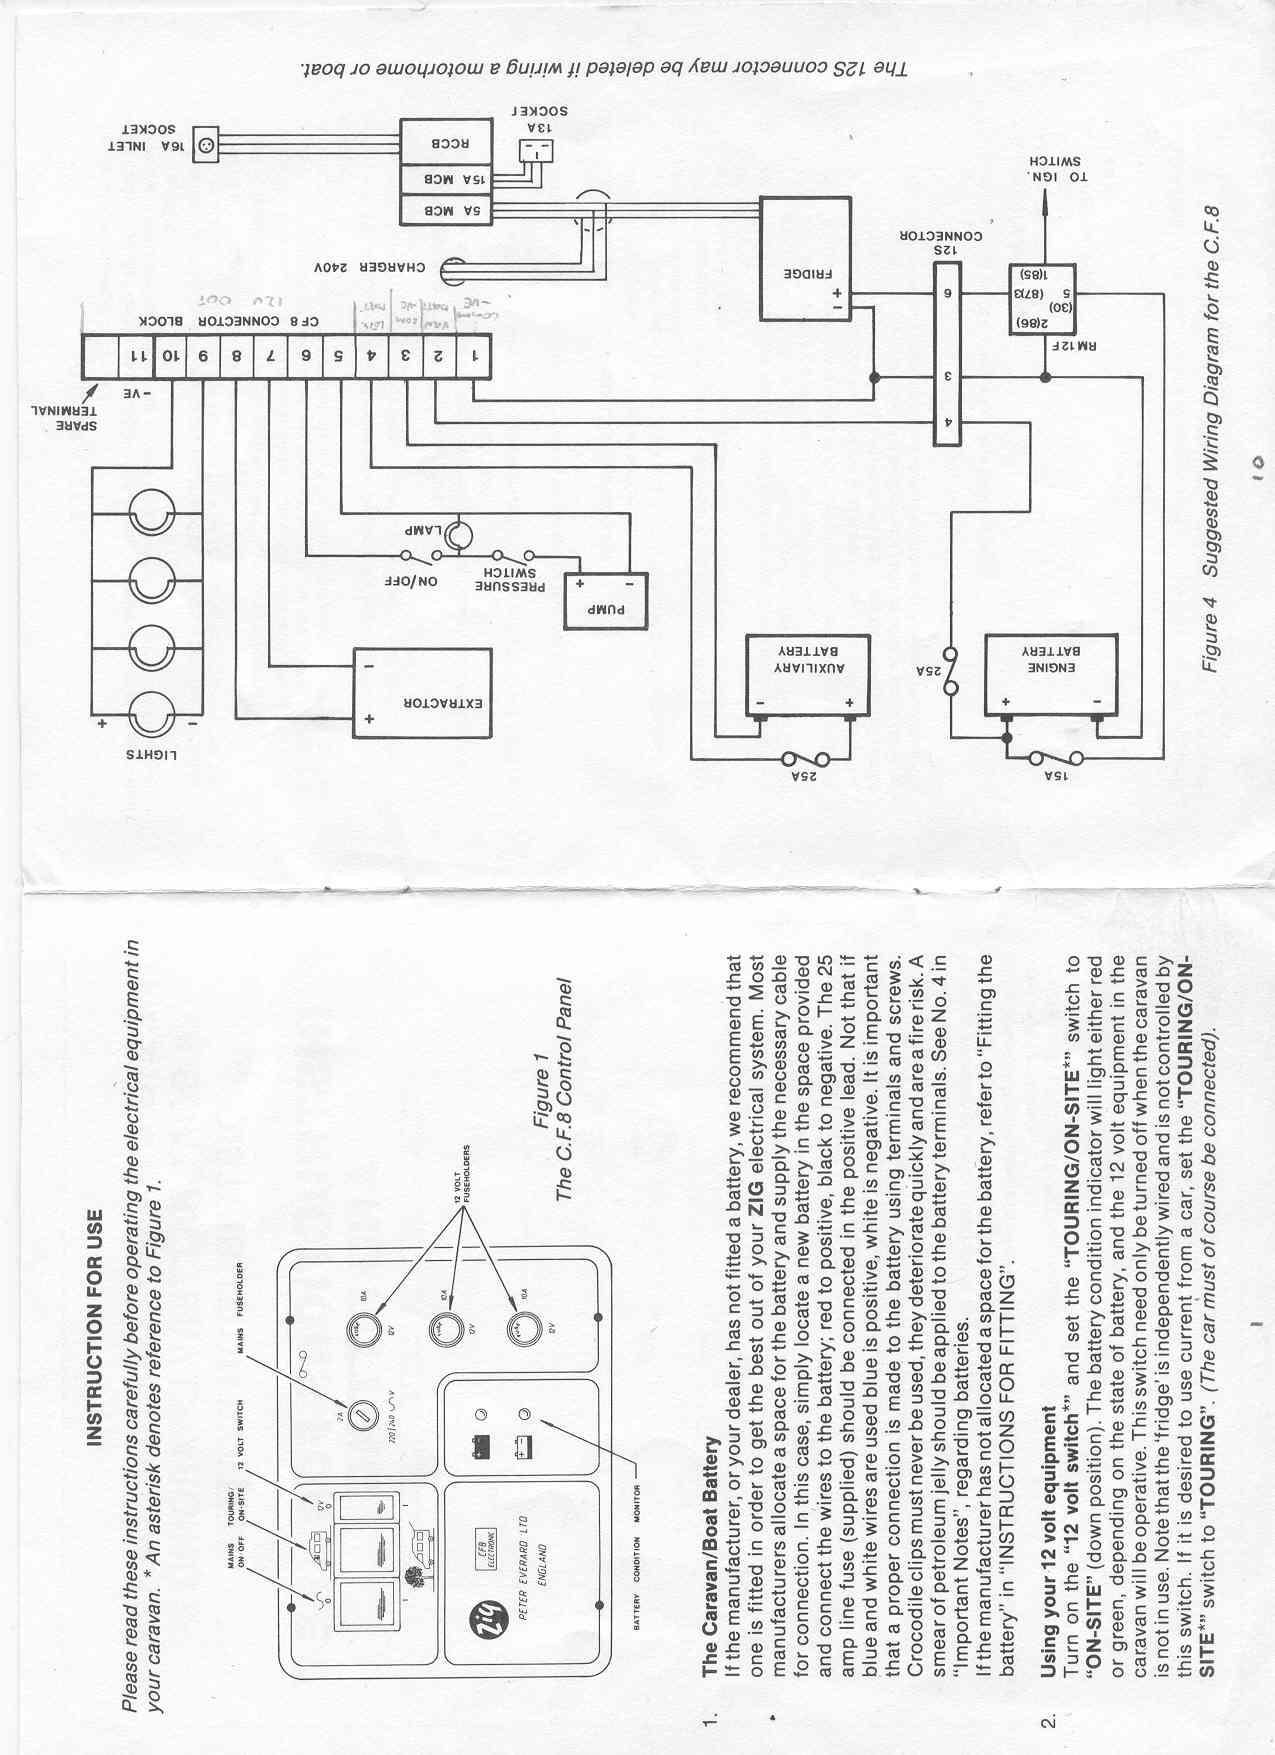 zig02 zig cf8 wiring diagram zig electronics \u2022 wiring diagrams j  at eliteediting.co